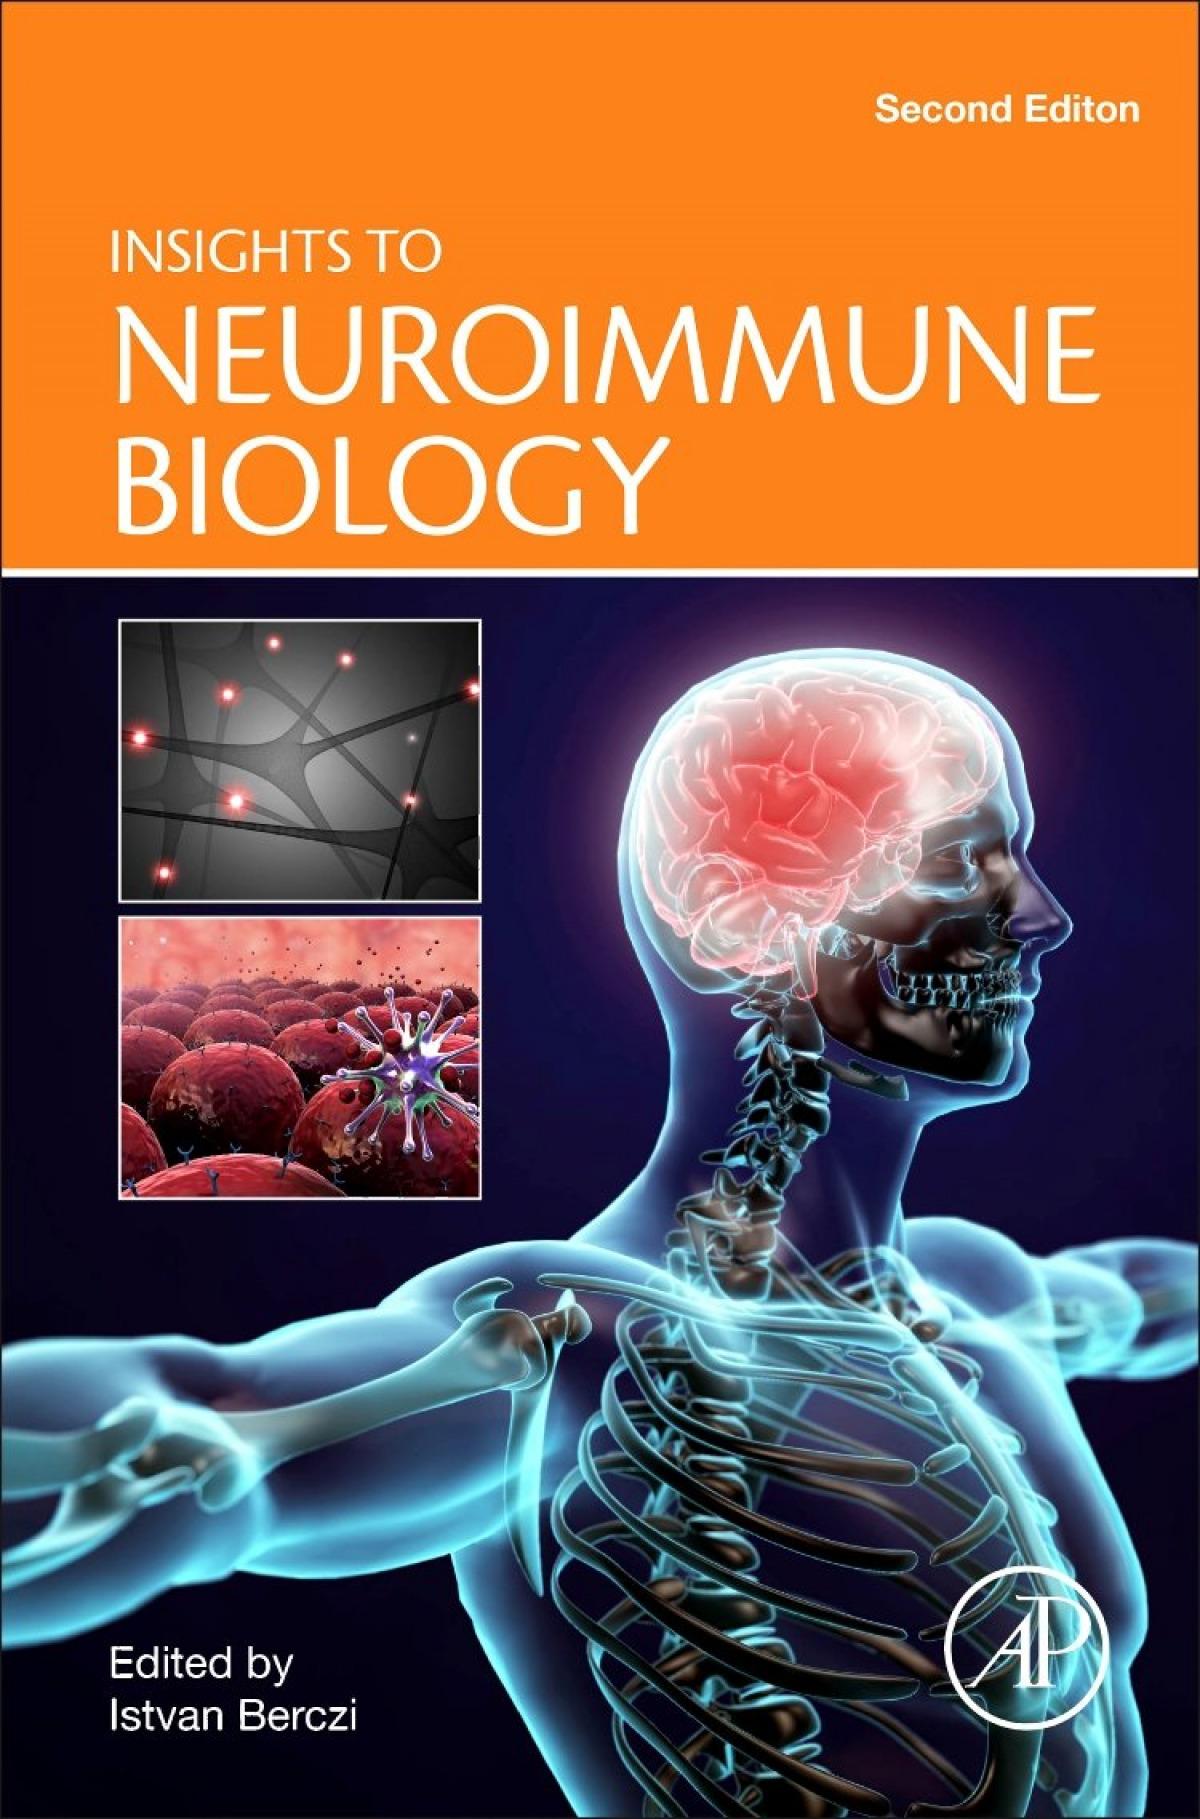 INSIGHTS TO NEUROIMMUNE BIOLOGY